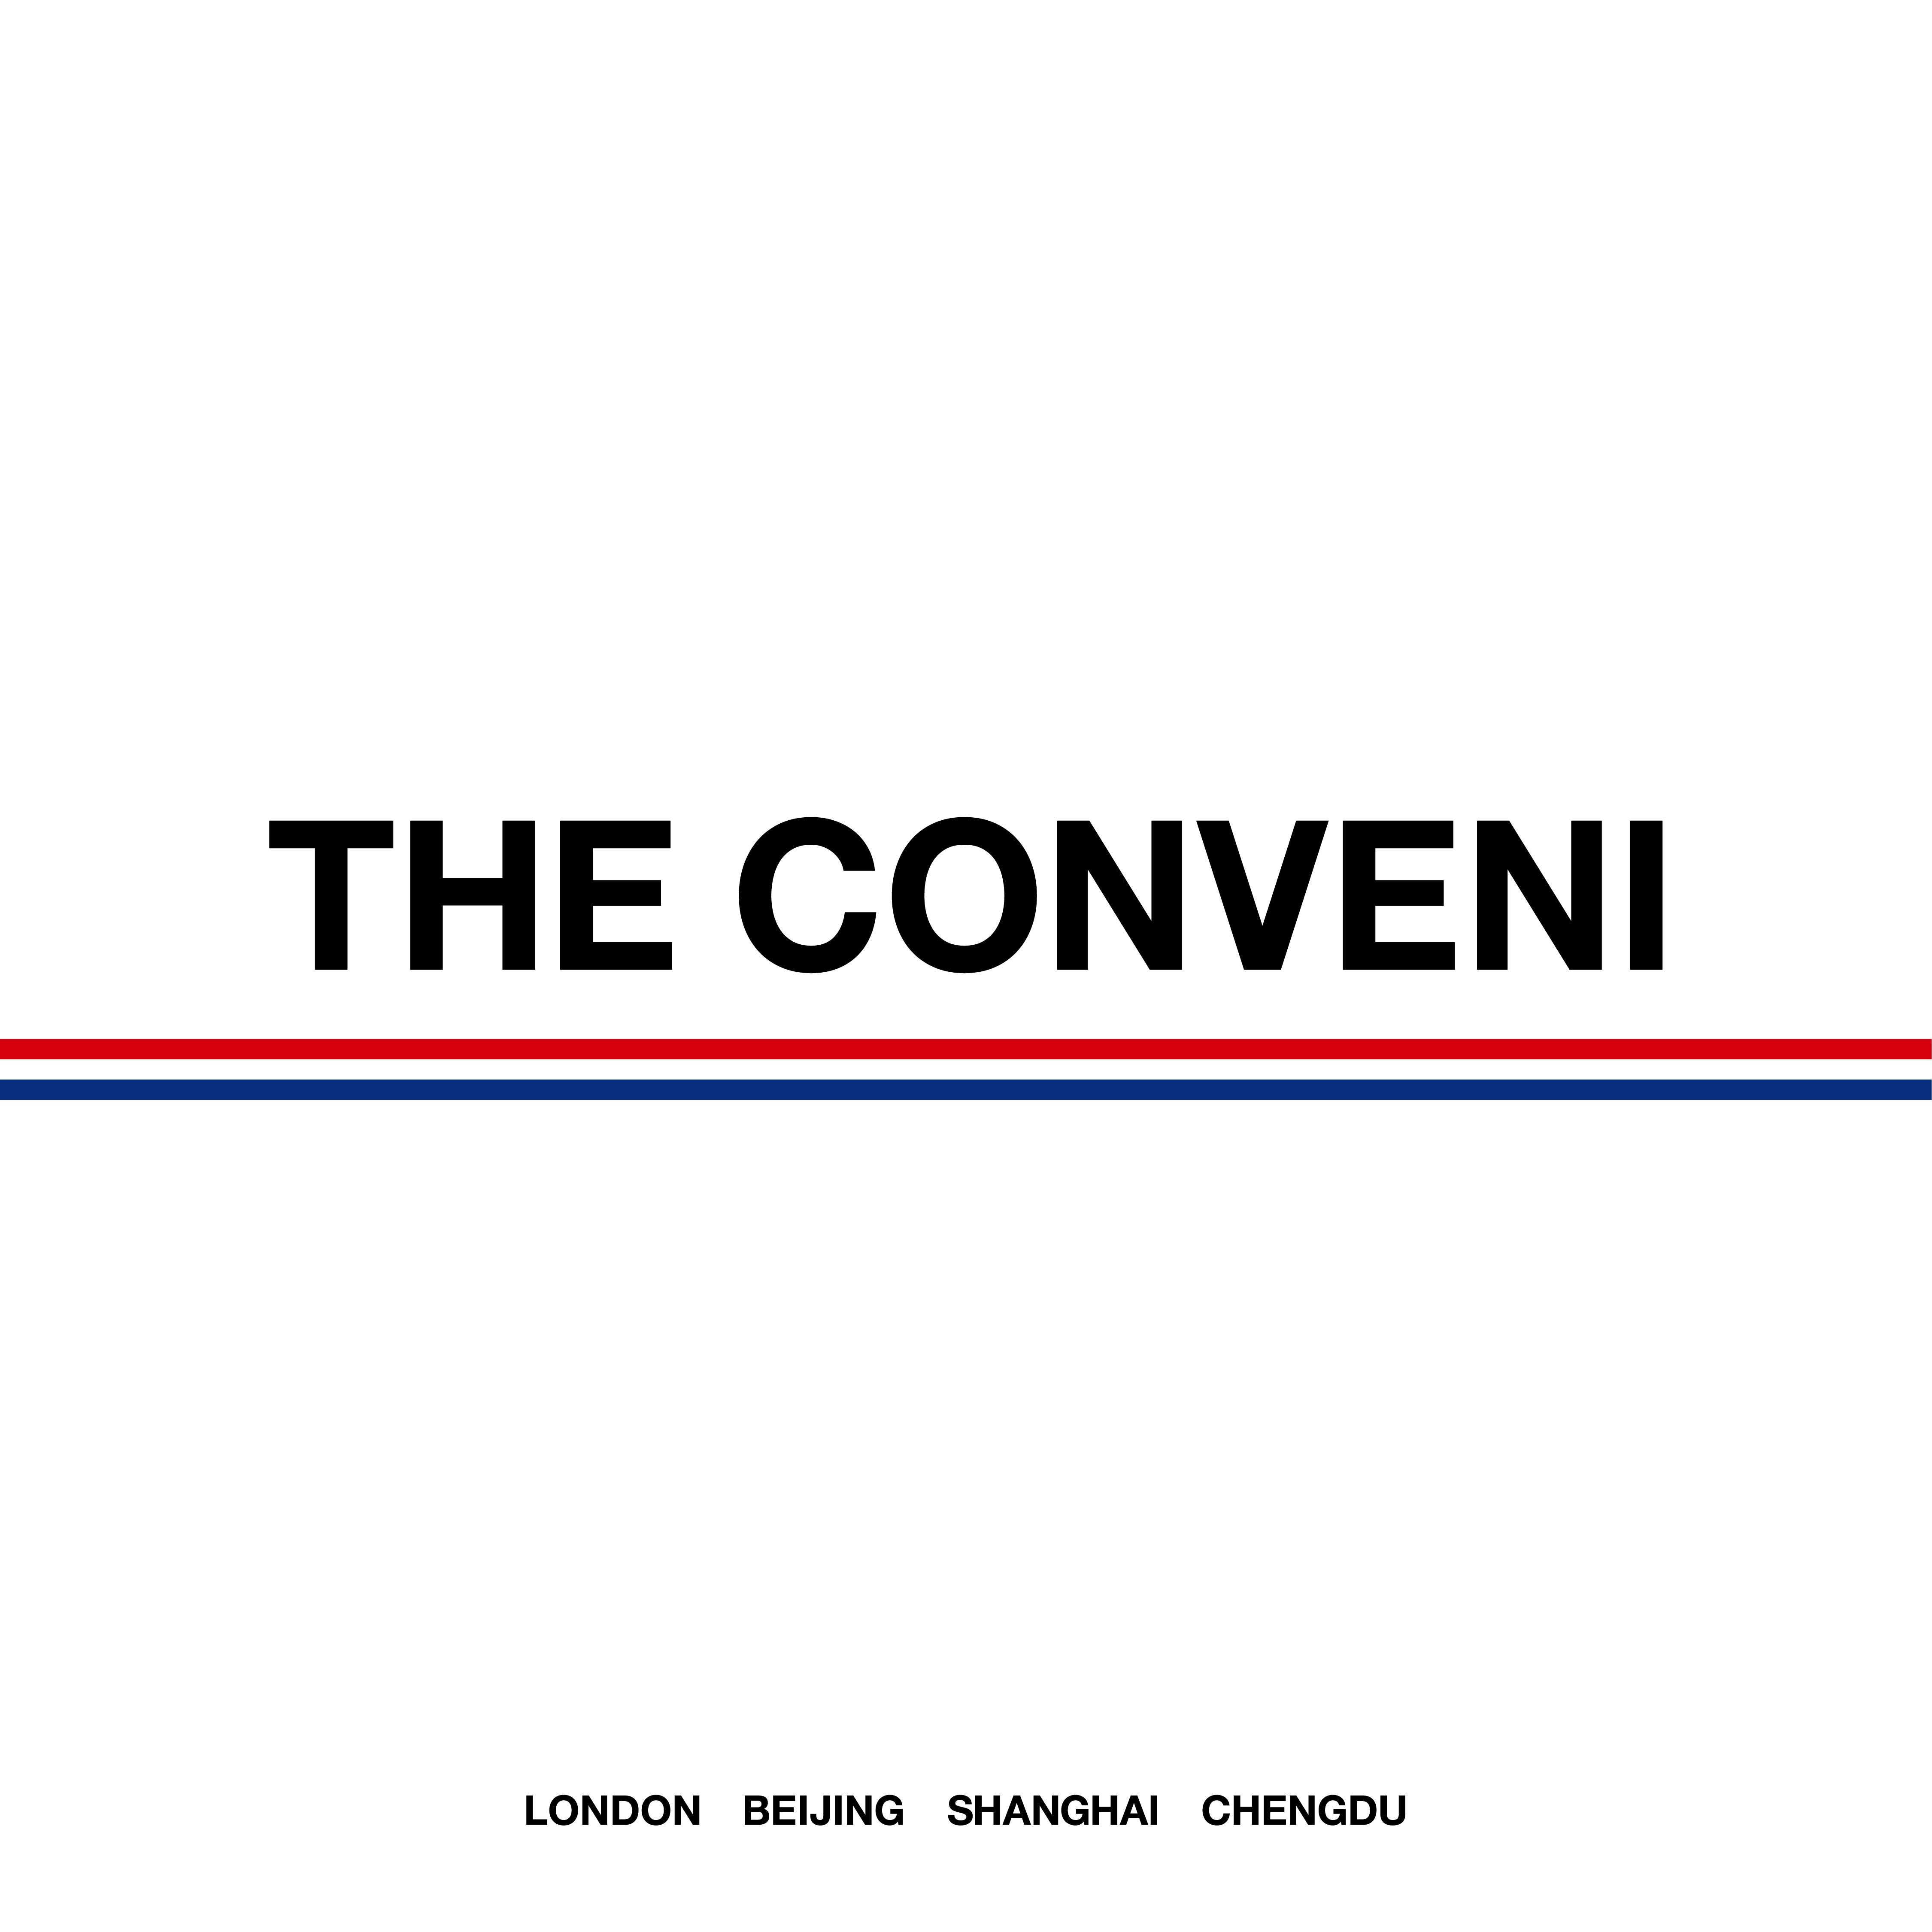 THE CONVENIポップアップ、海外4都市で開催 オンラインストアでも